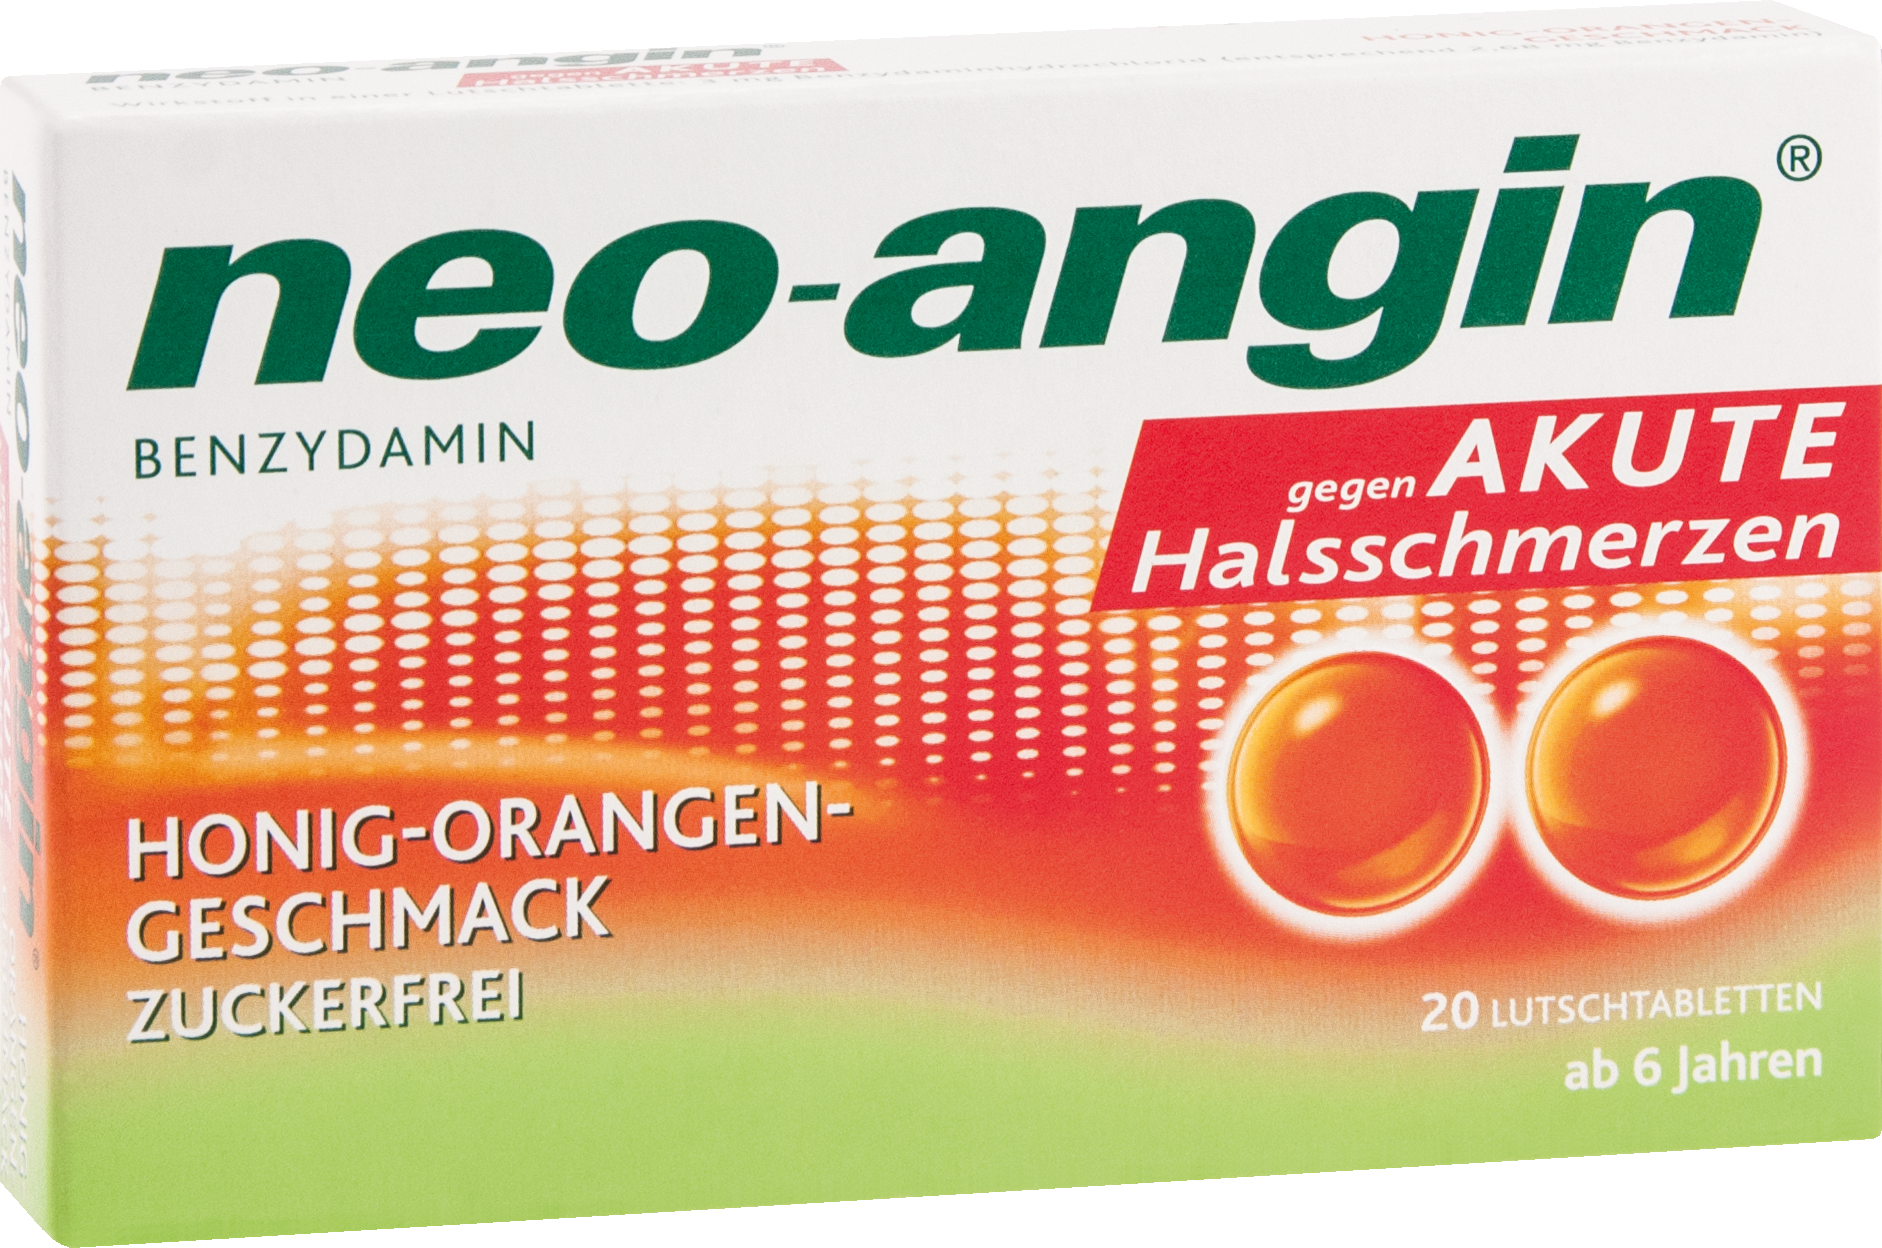 neo-angin Benzydamin akute Halsschmerz Honig-Orang